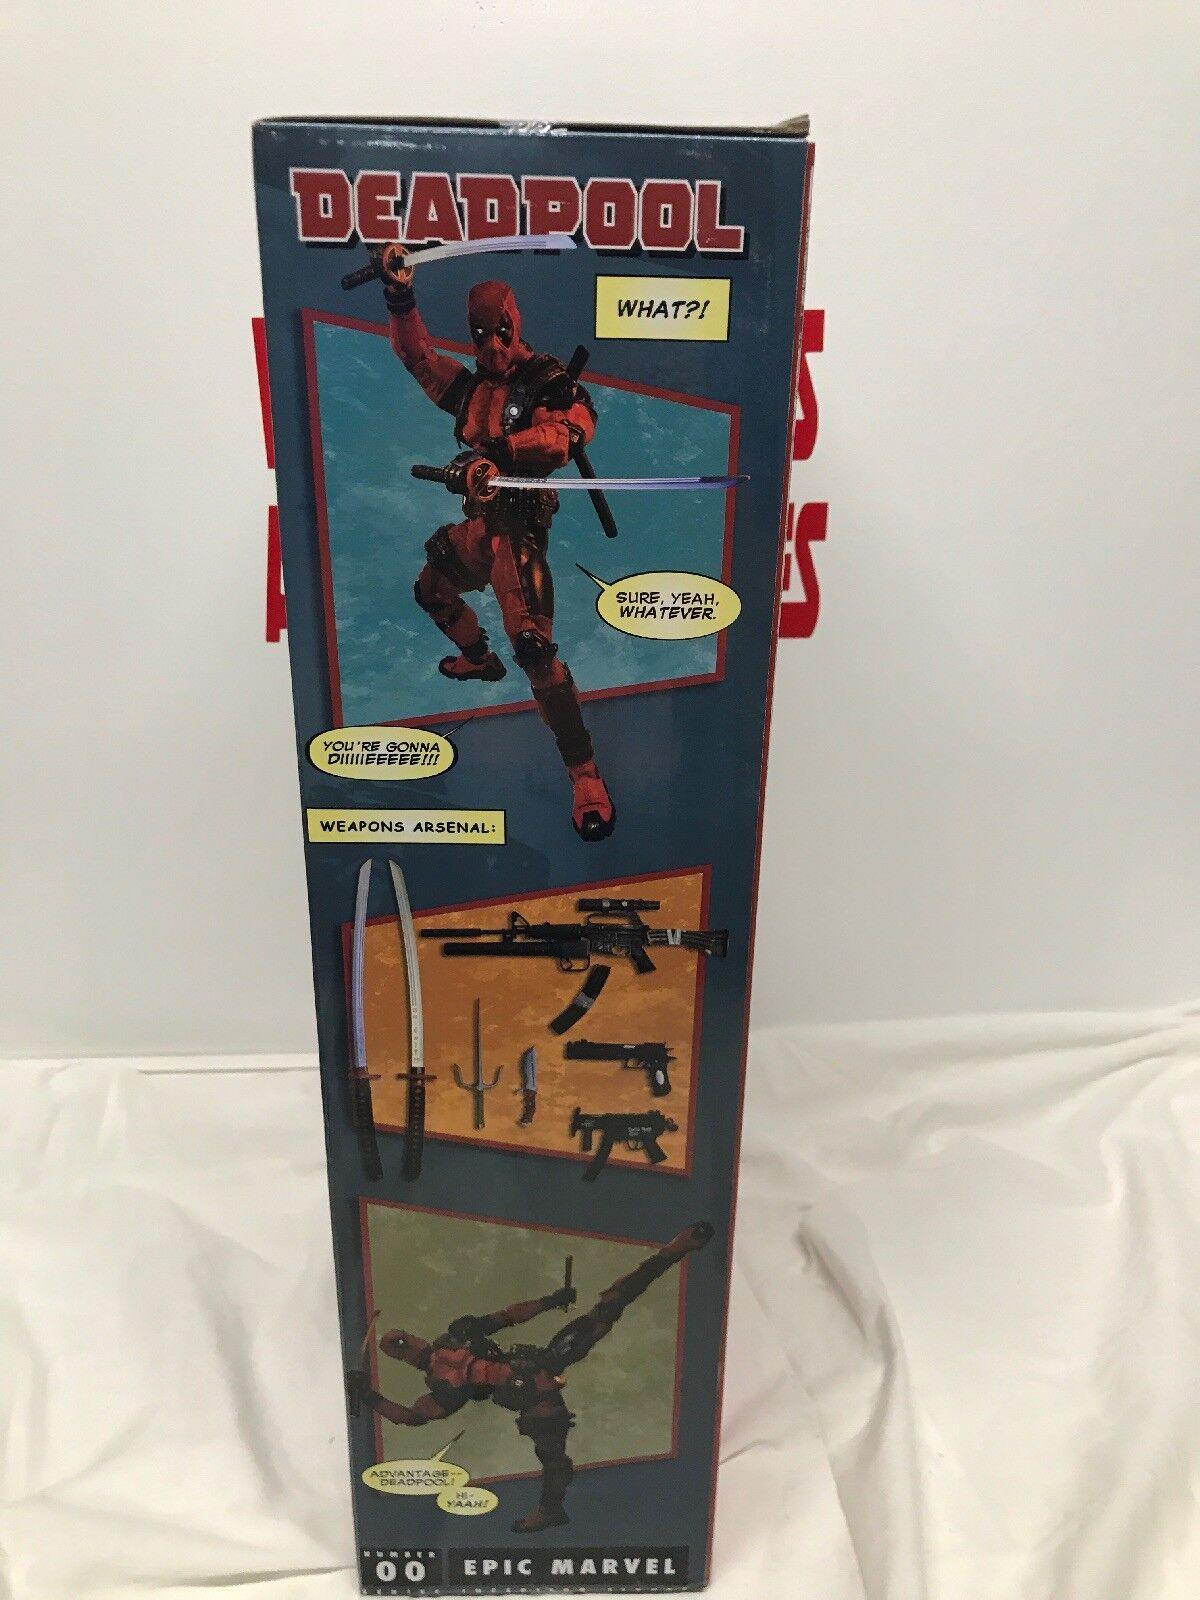 Marvel Marvel Marvel Comics  18-INCH (1/4 SCALE) DEADPOOL ACTION FIGURE  NECA REEL TOYS b6ca78